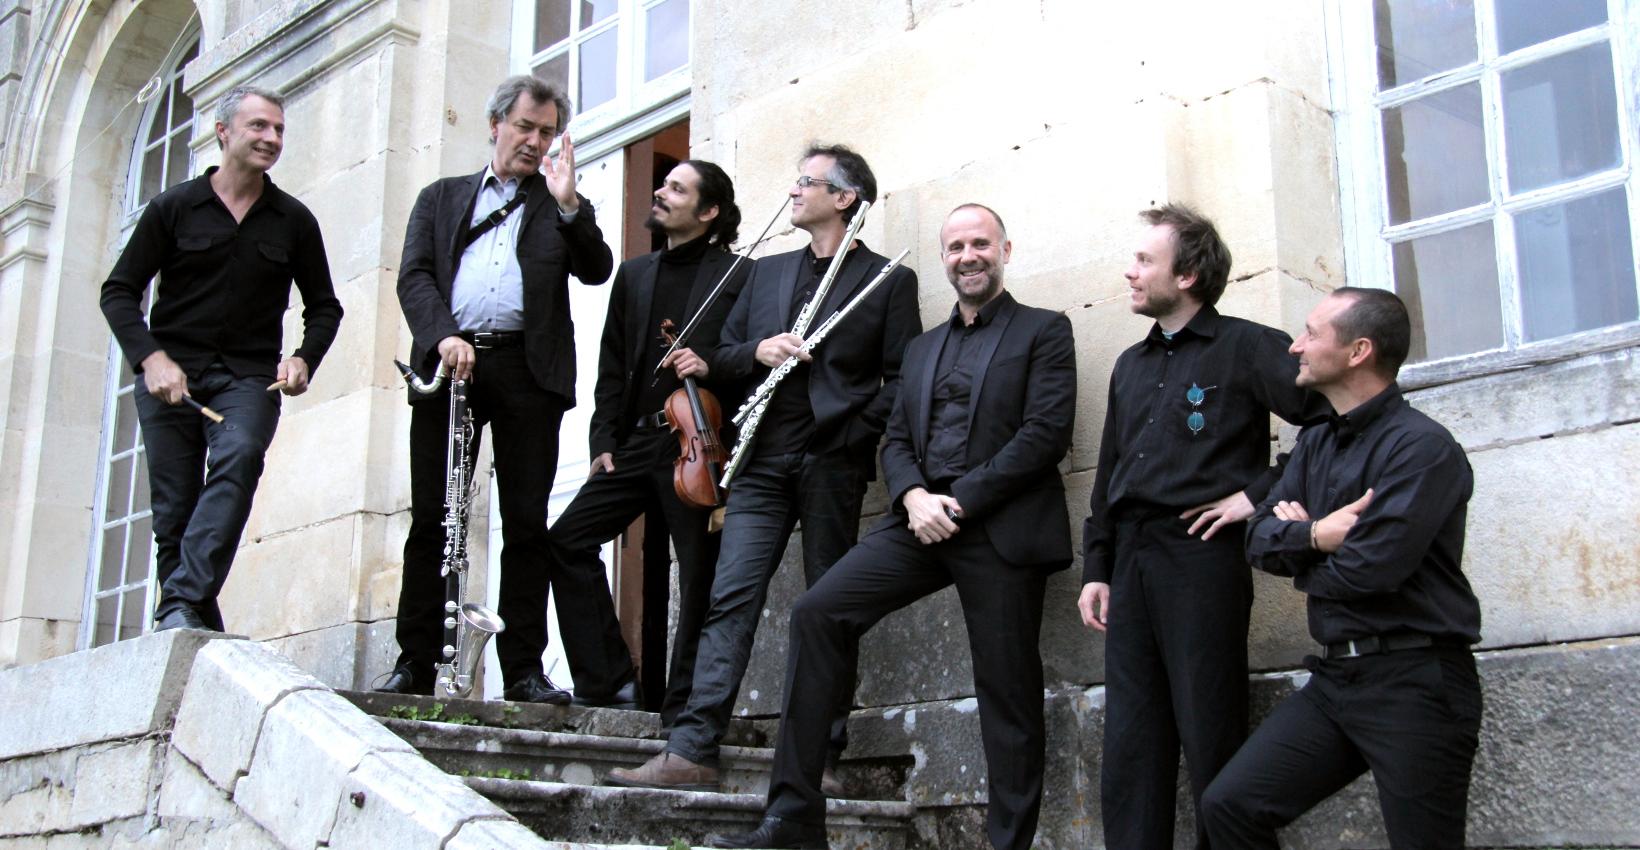 concert-hostel-dieu-video-swinging-rameau-denis-colin